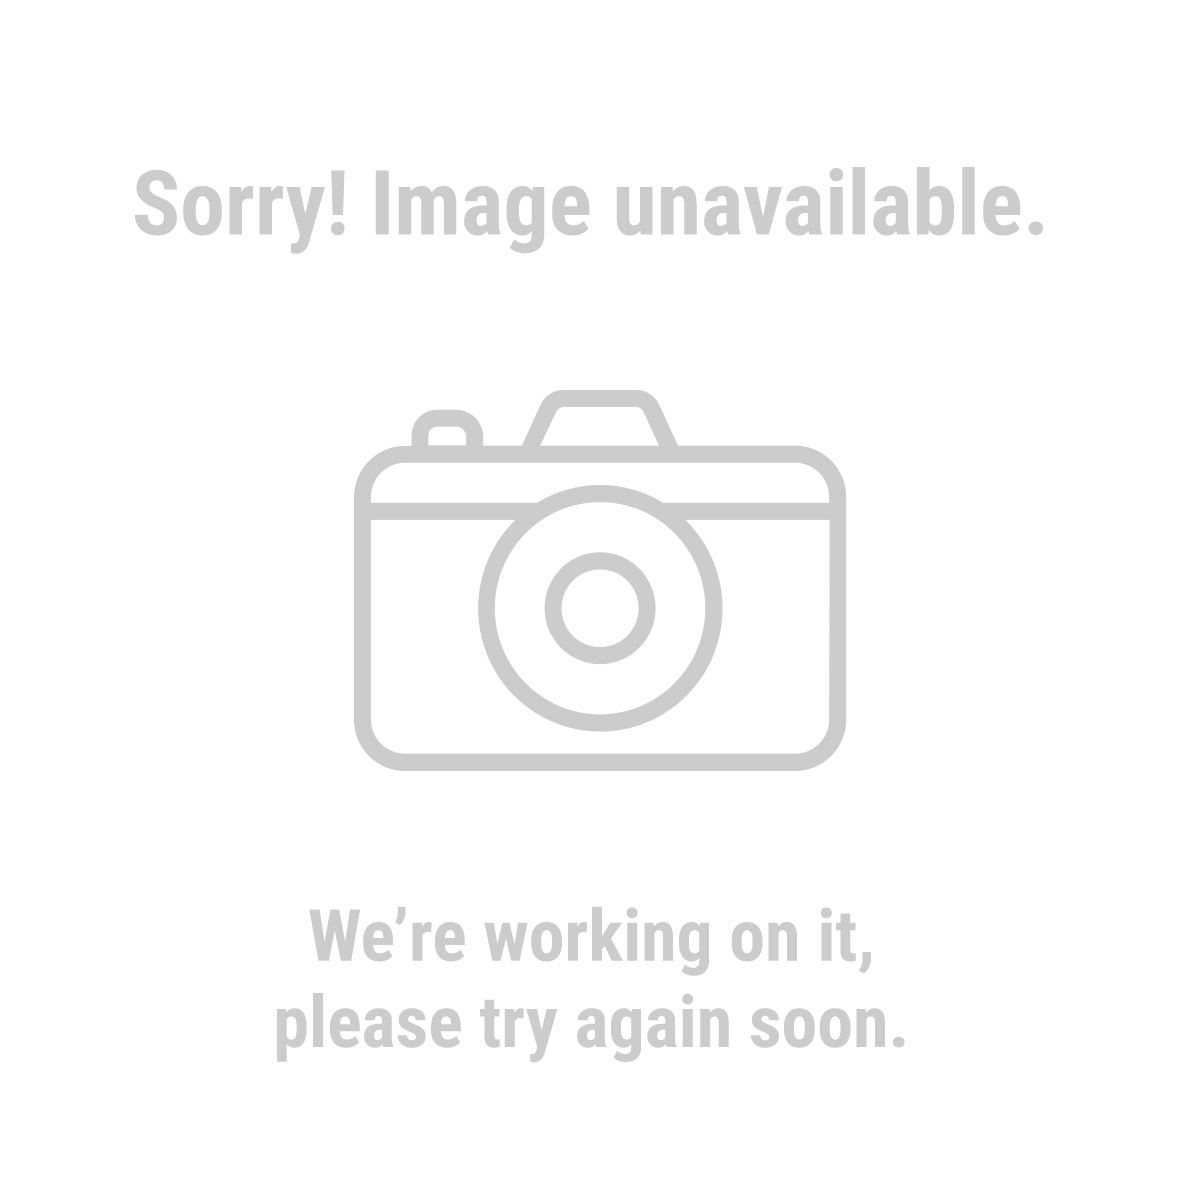 HARDY 61365 Jersey Gloves 5 Pr